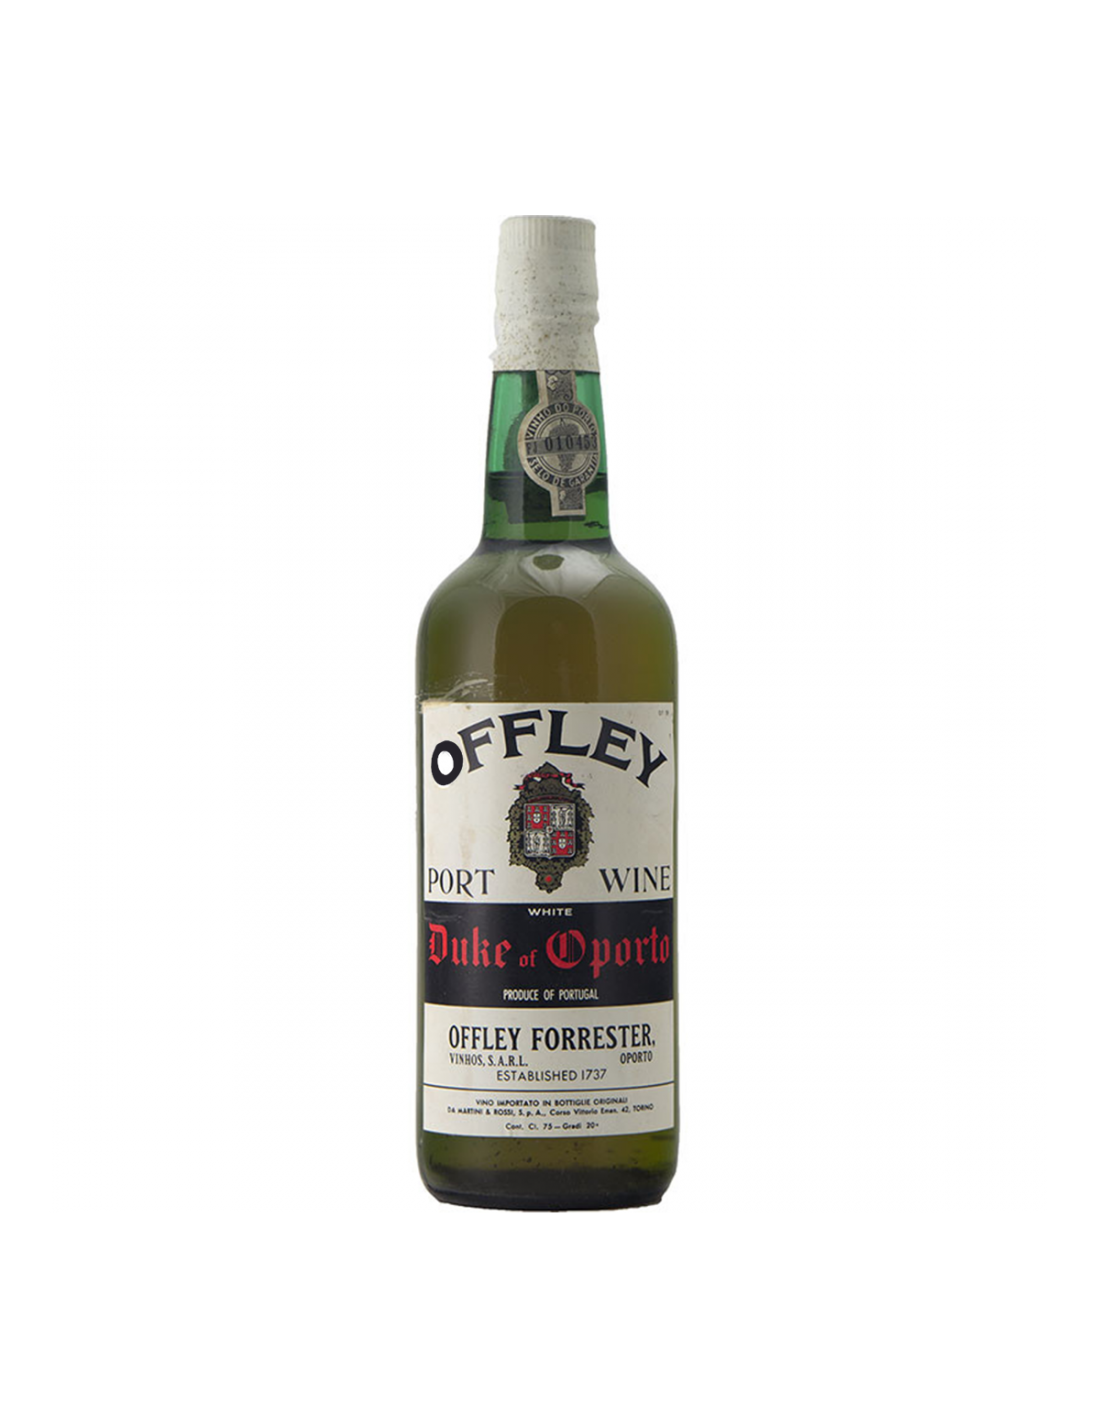 WHITE PORT DUKE OF OPORTO NV OFFLEY FORRESTER Grandi Bottiglie